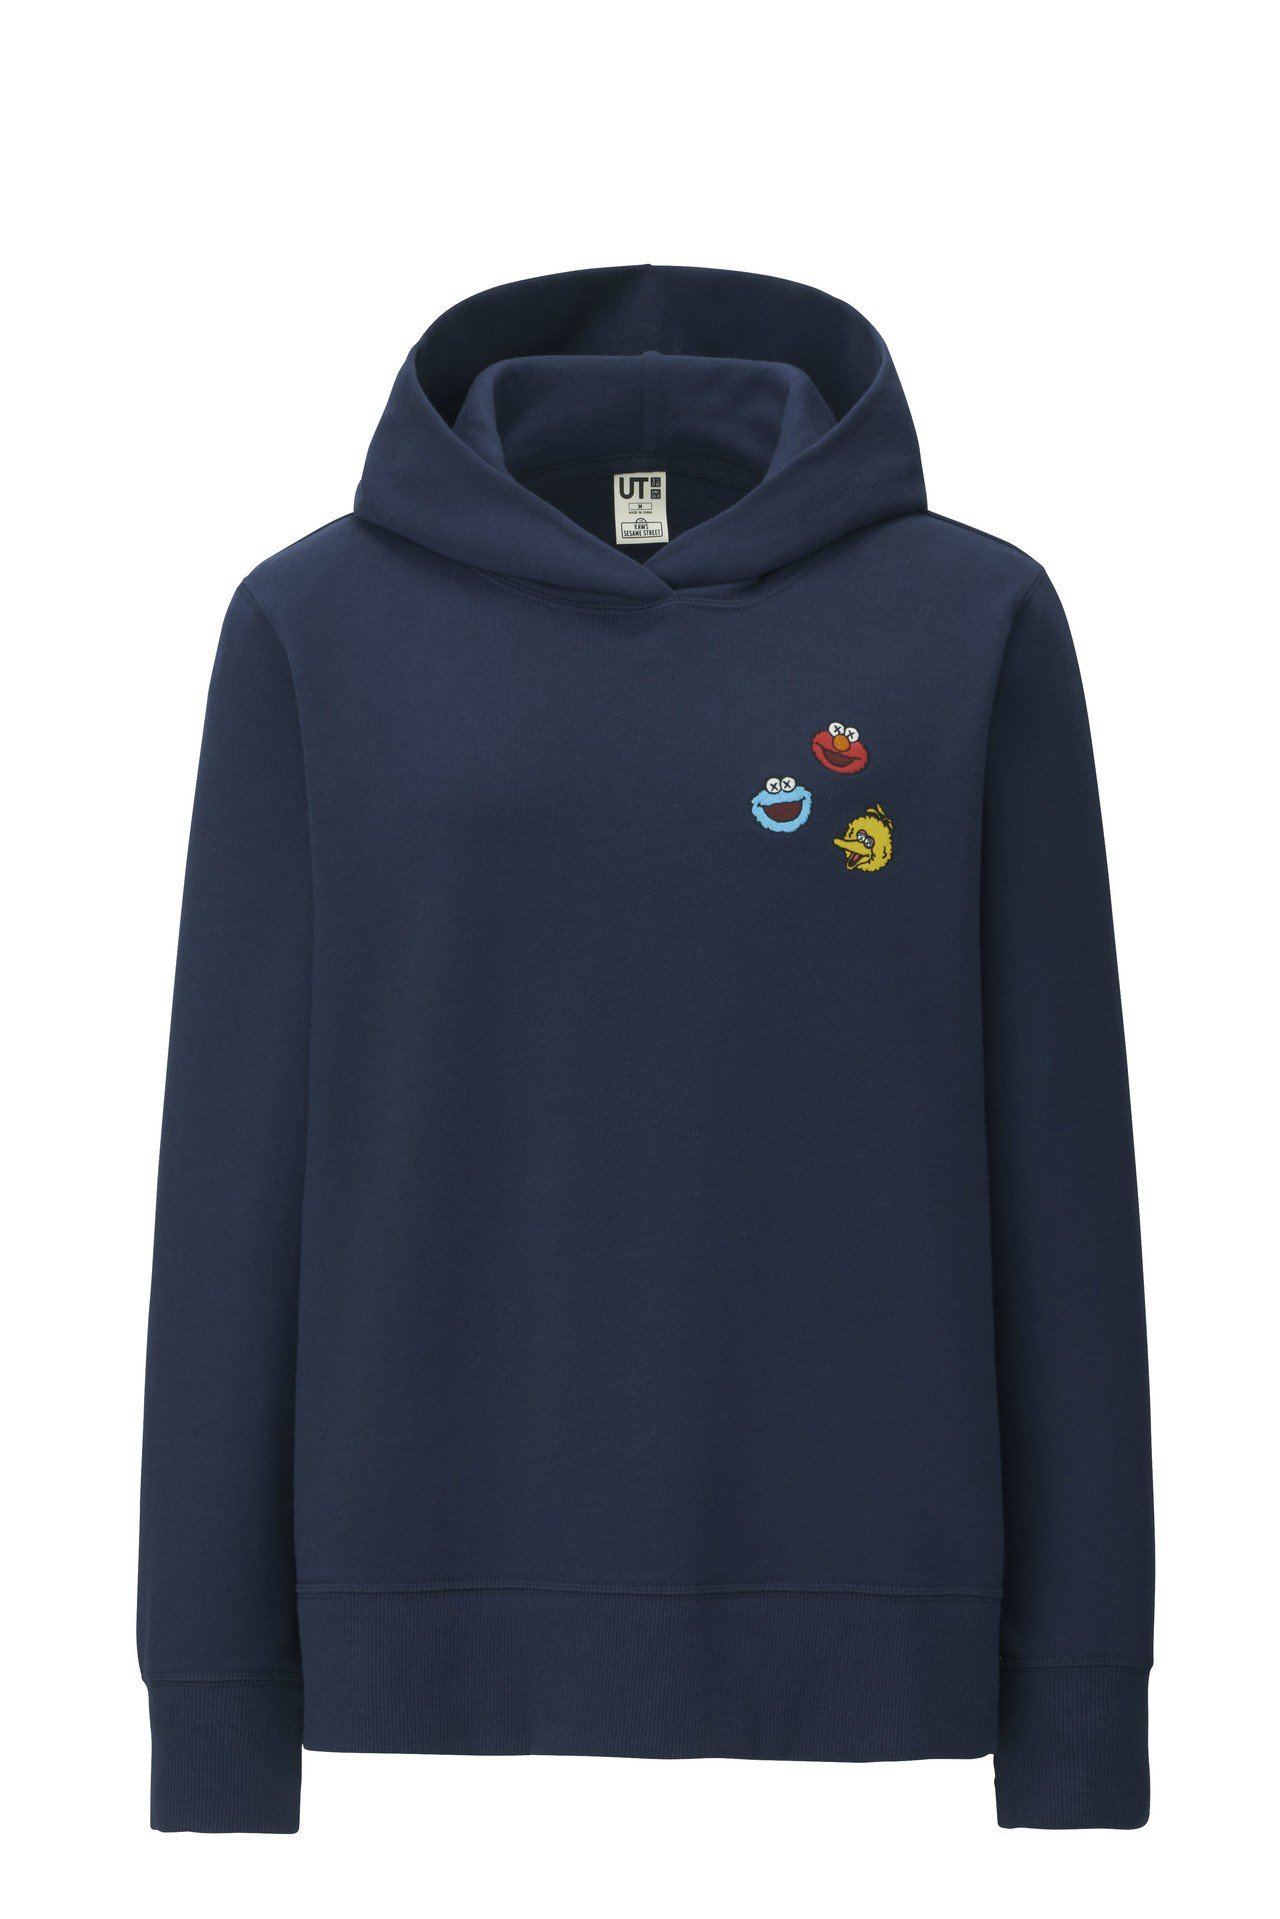 KAWS X SESAME STREET 休閒連帽上衣(女),售價790元。圖/...